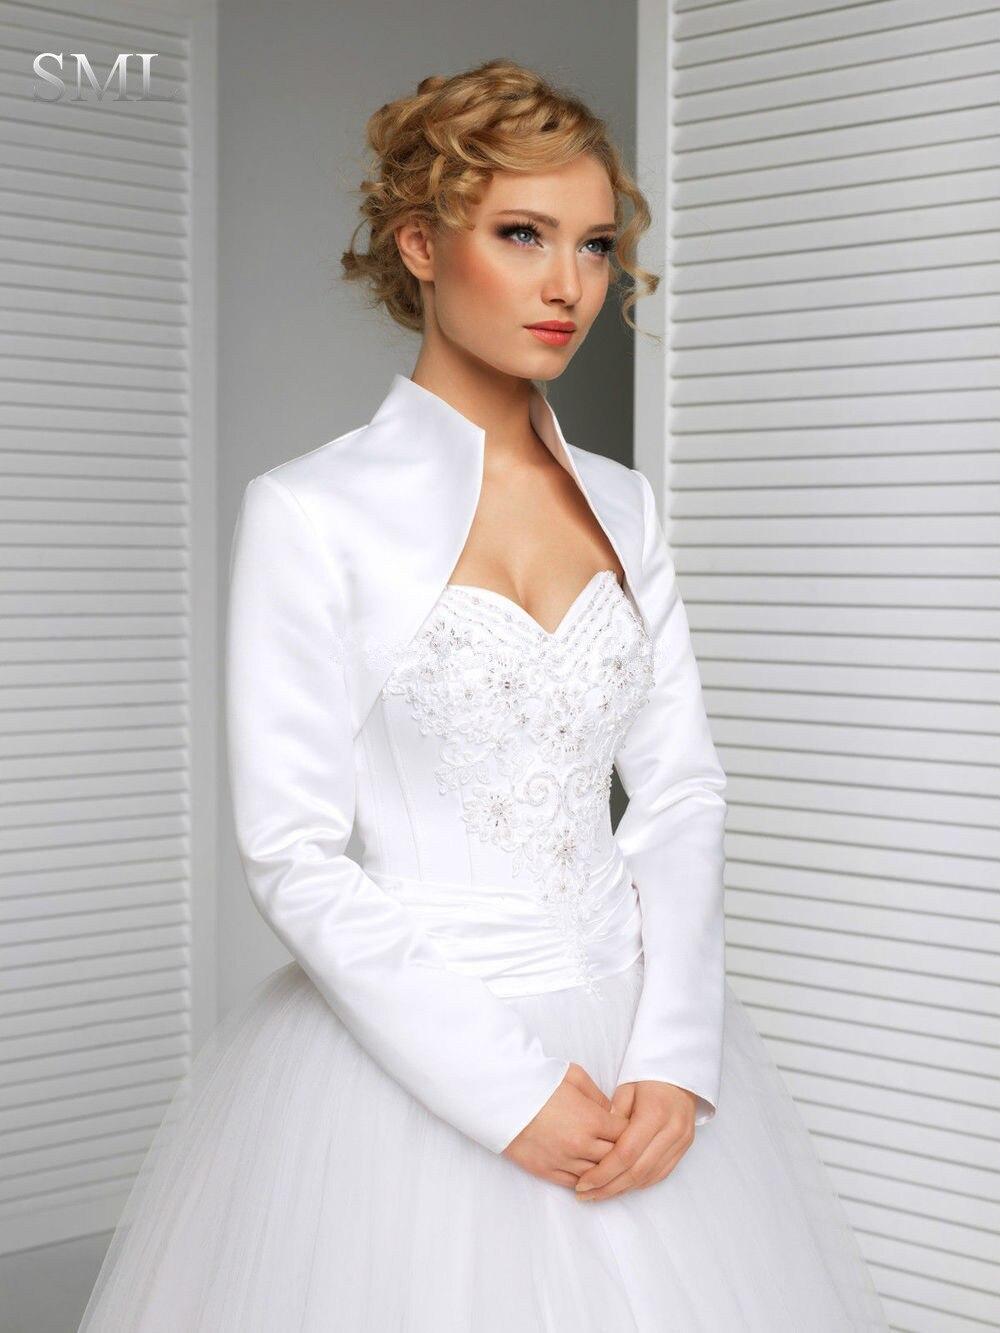 Sml New Bridal Satin Jacket Wrap Wedding Shrug Long Sleeve Bolero Abrigo Plumas Winter Cape Sudaderas Hombre Fourrure In Jackets From